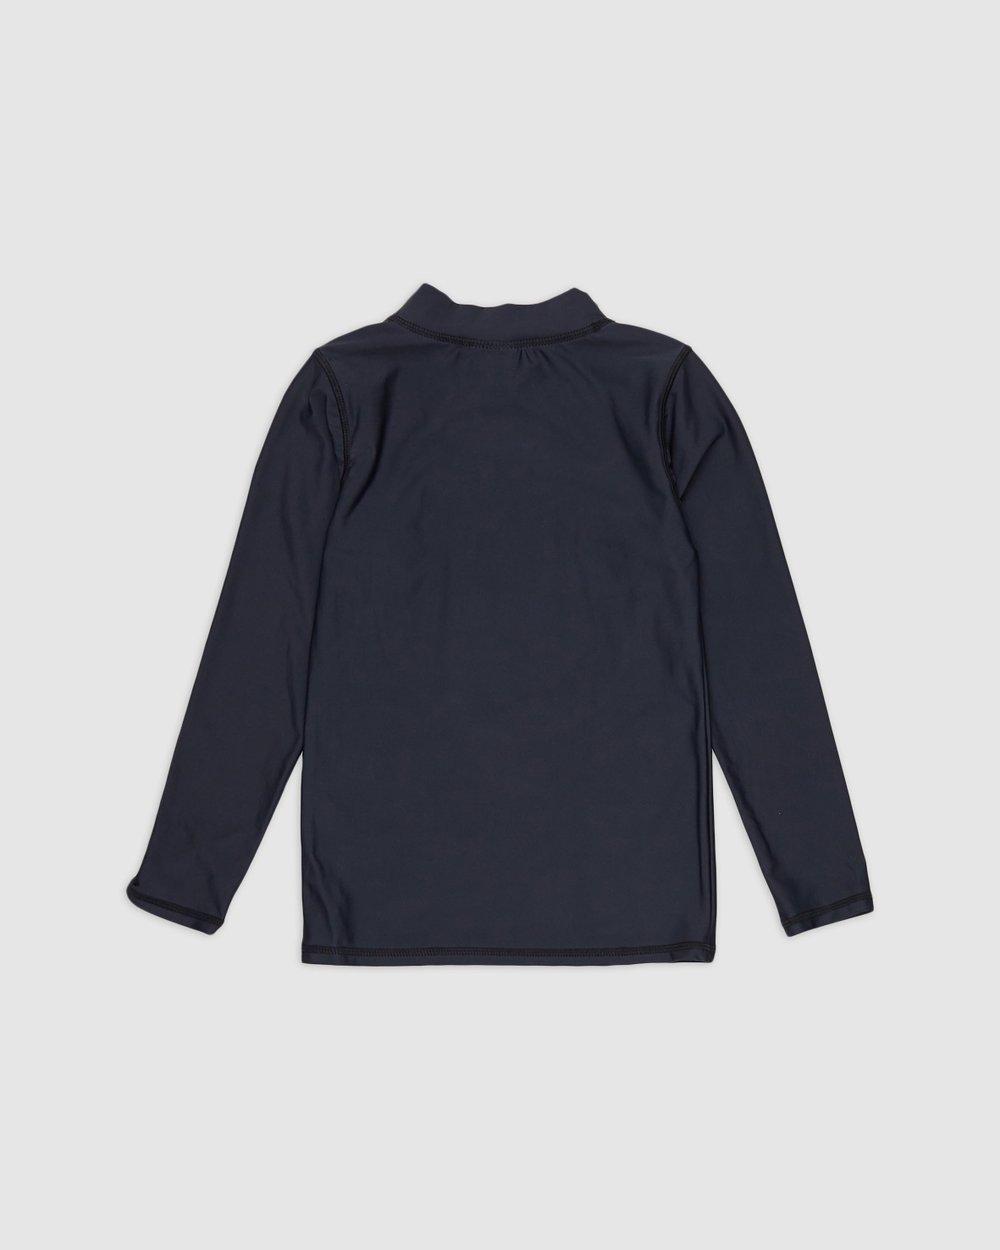 42f2b8e51 Fraser Long Sleeve Rash Vest - Kids by Cotton On Kids Online   THE ICONIC    Australia